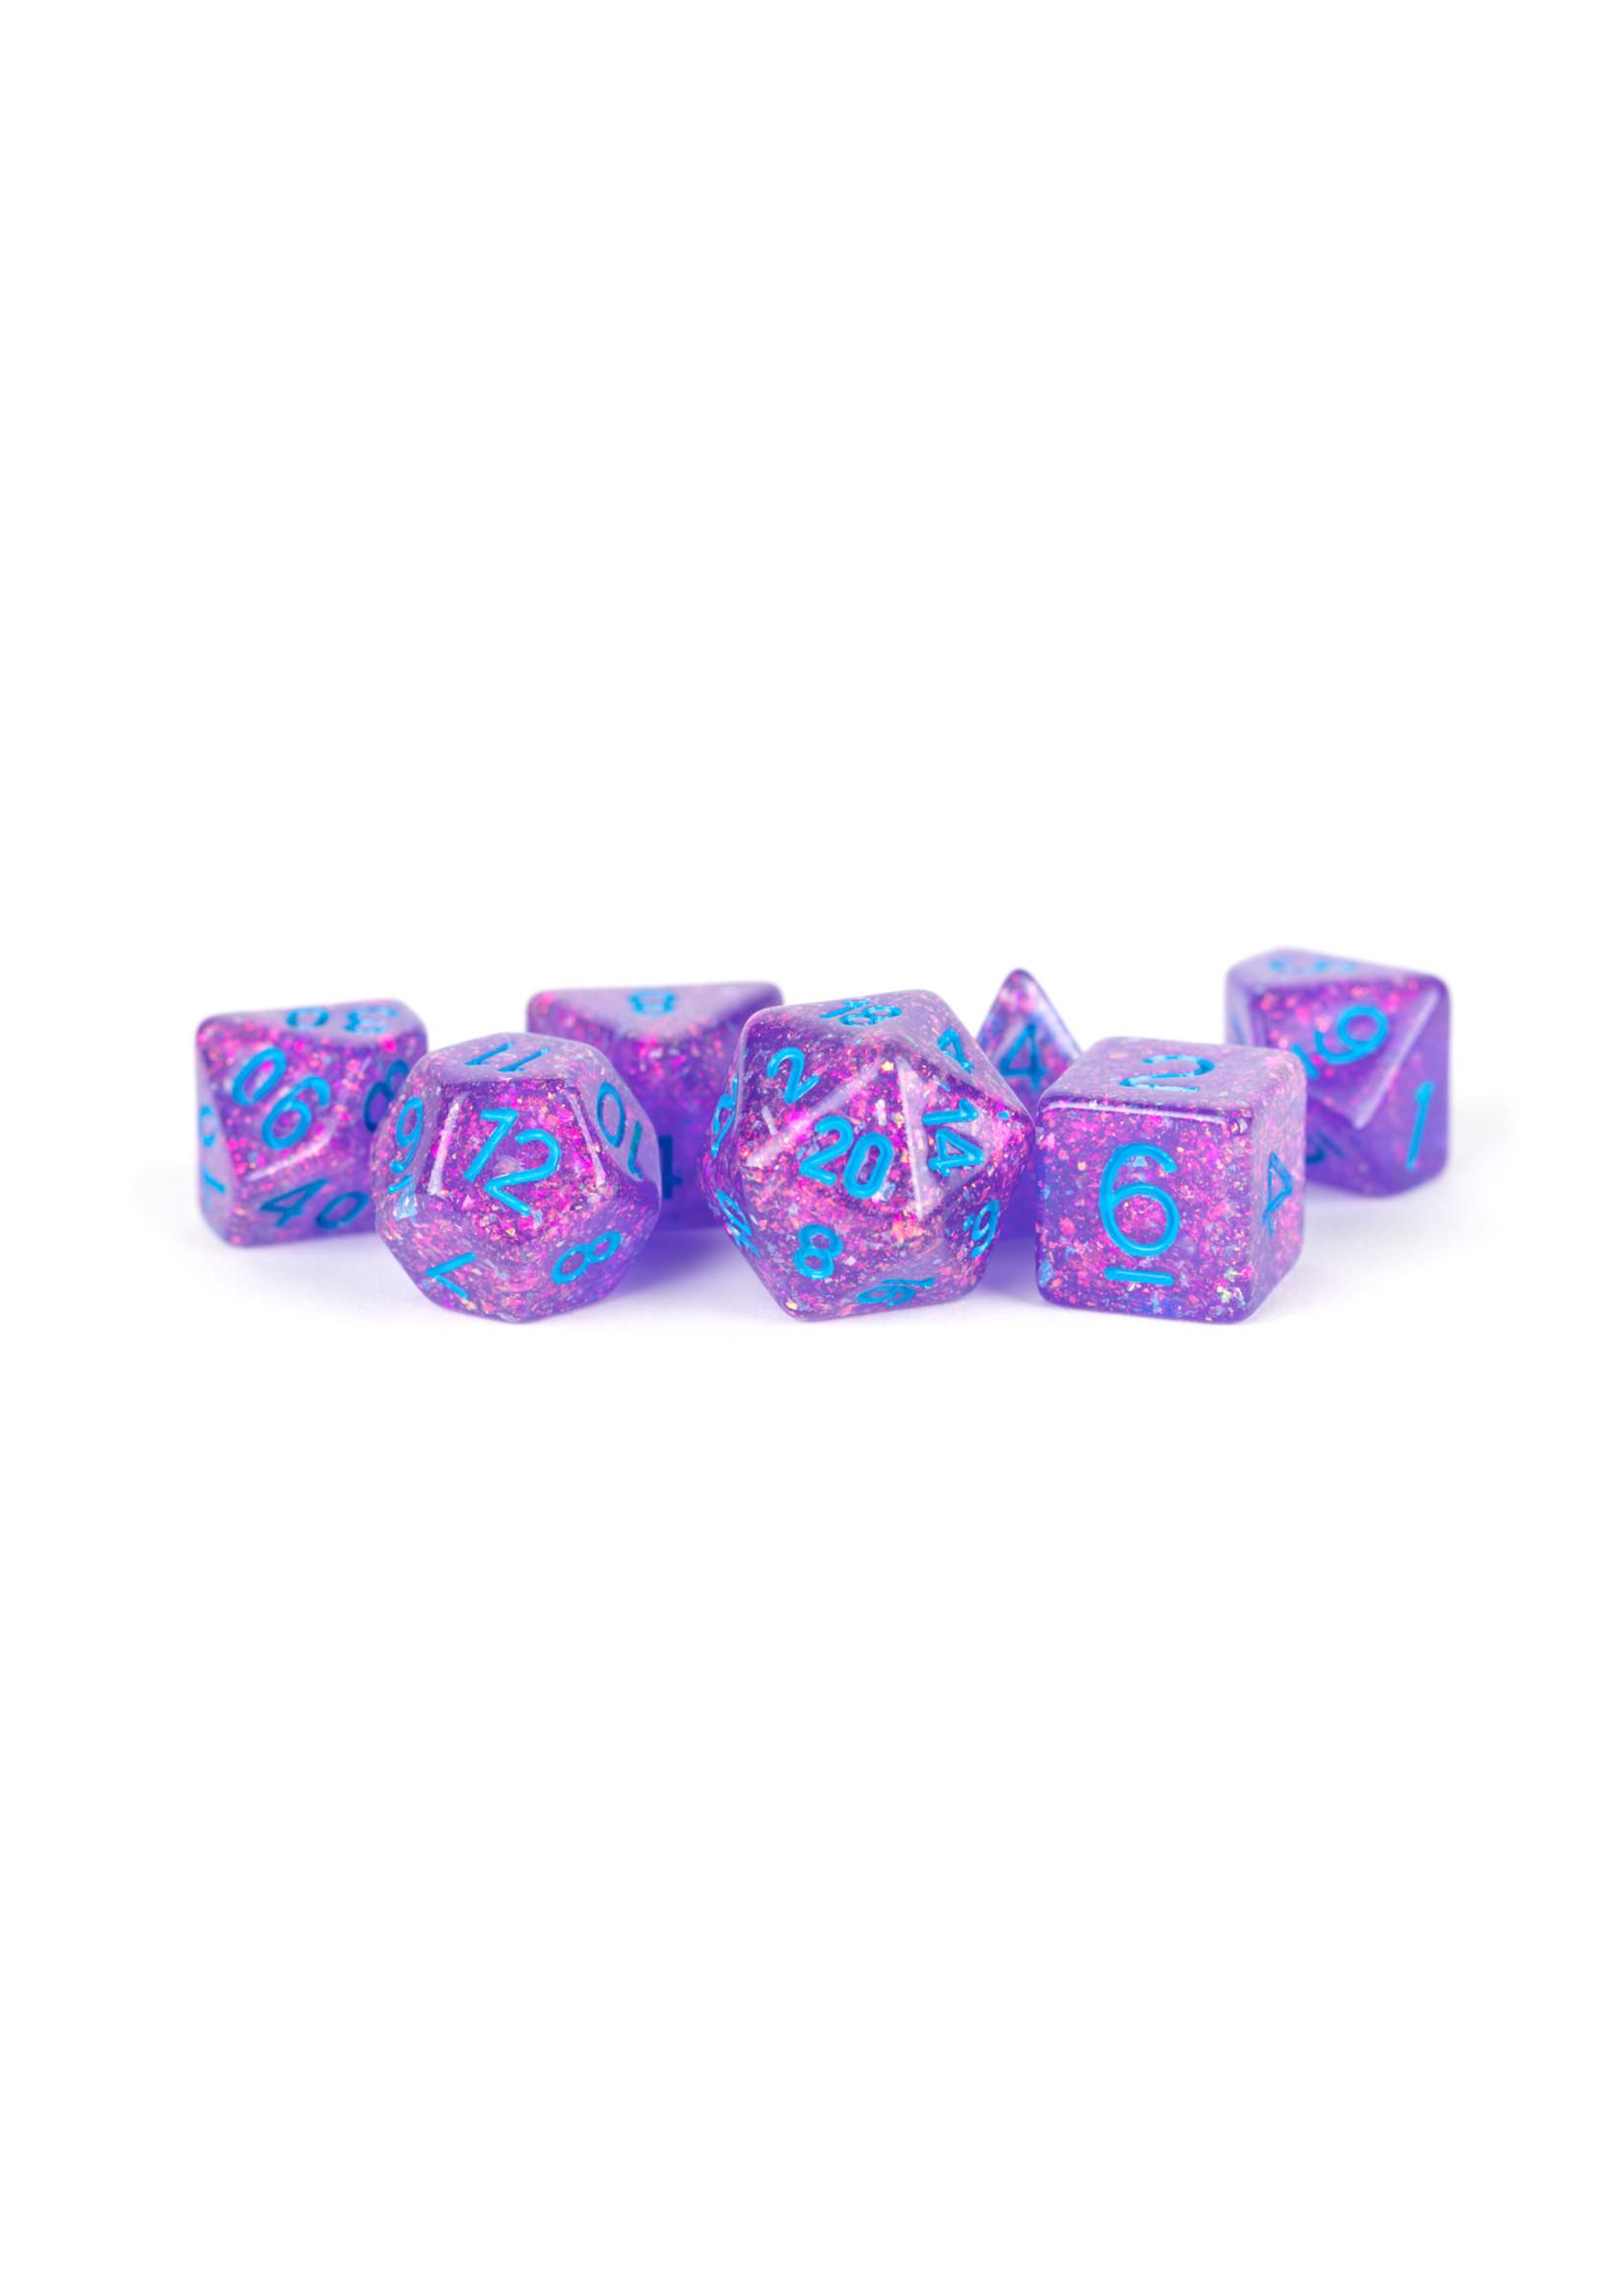 16mm Resin Flash Dice Poly Set: Purple (7)